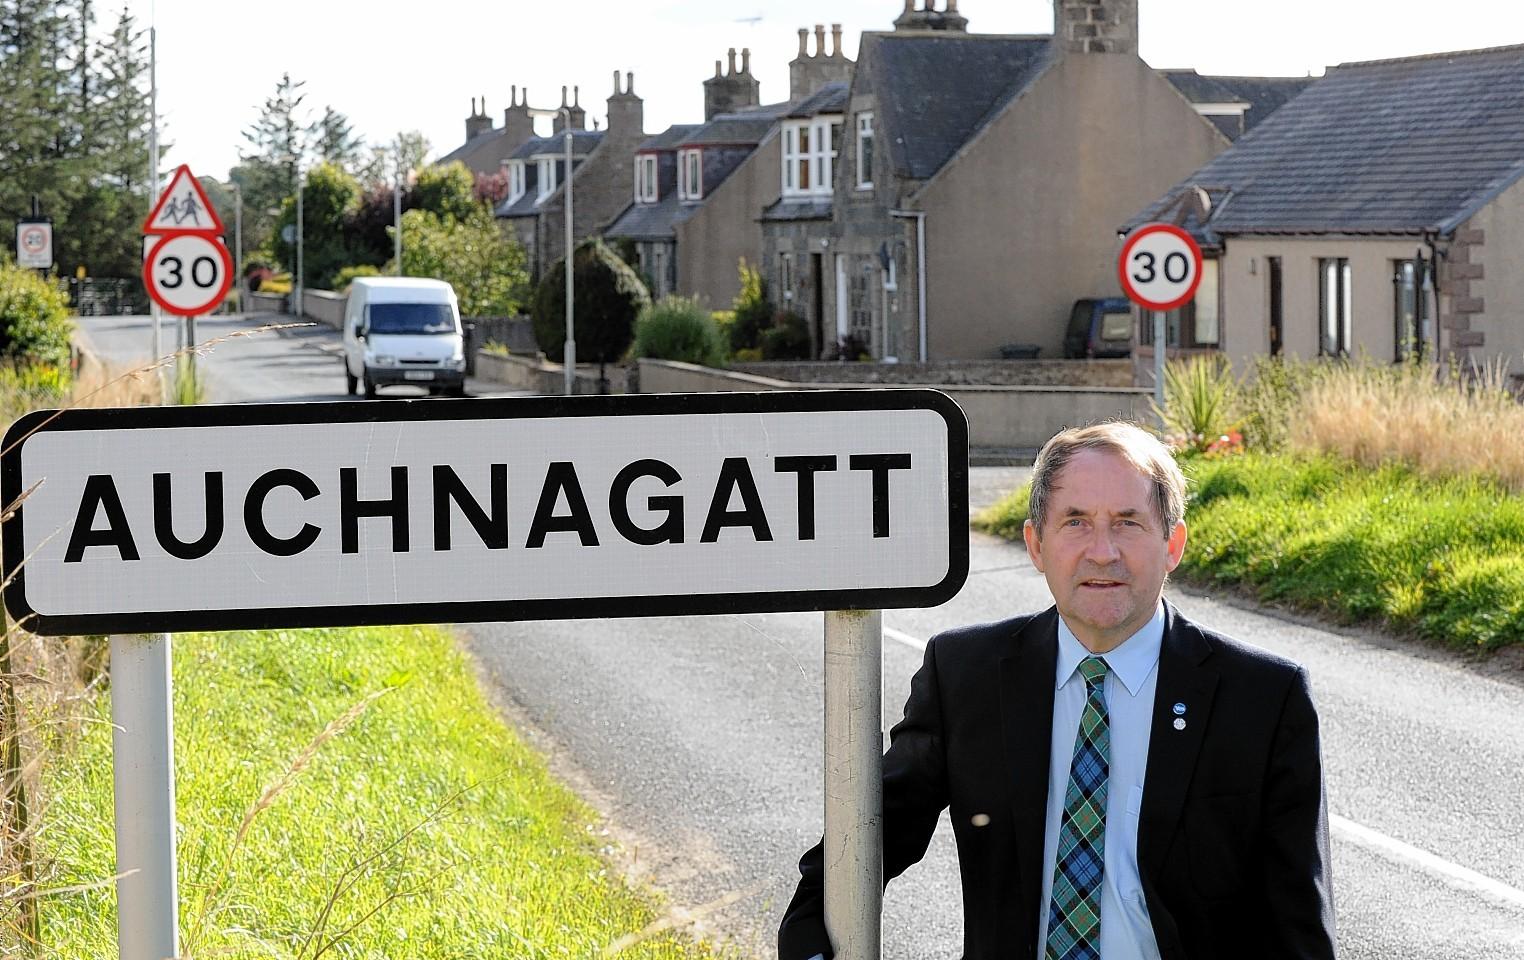 Councillor Jim Ingram at Auchnagatt